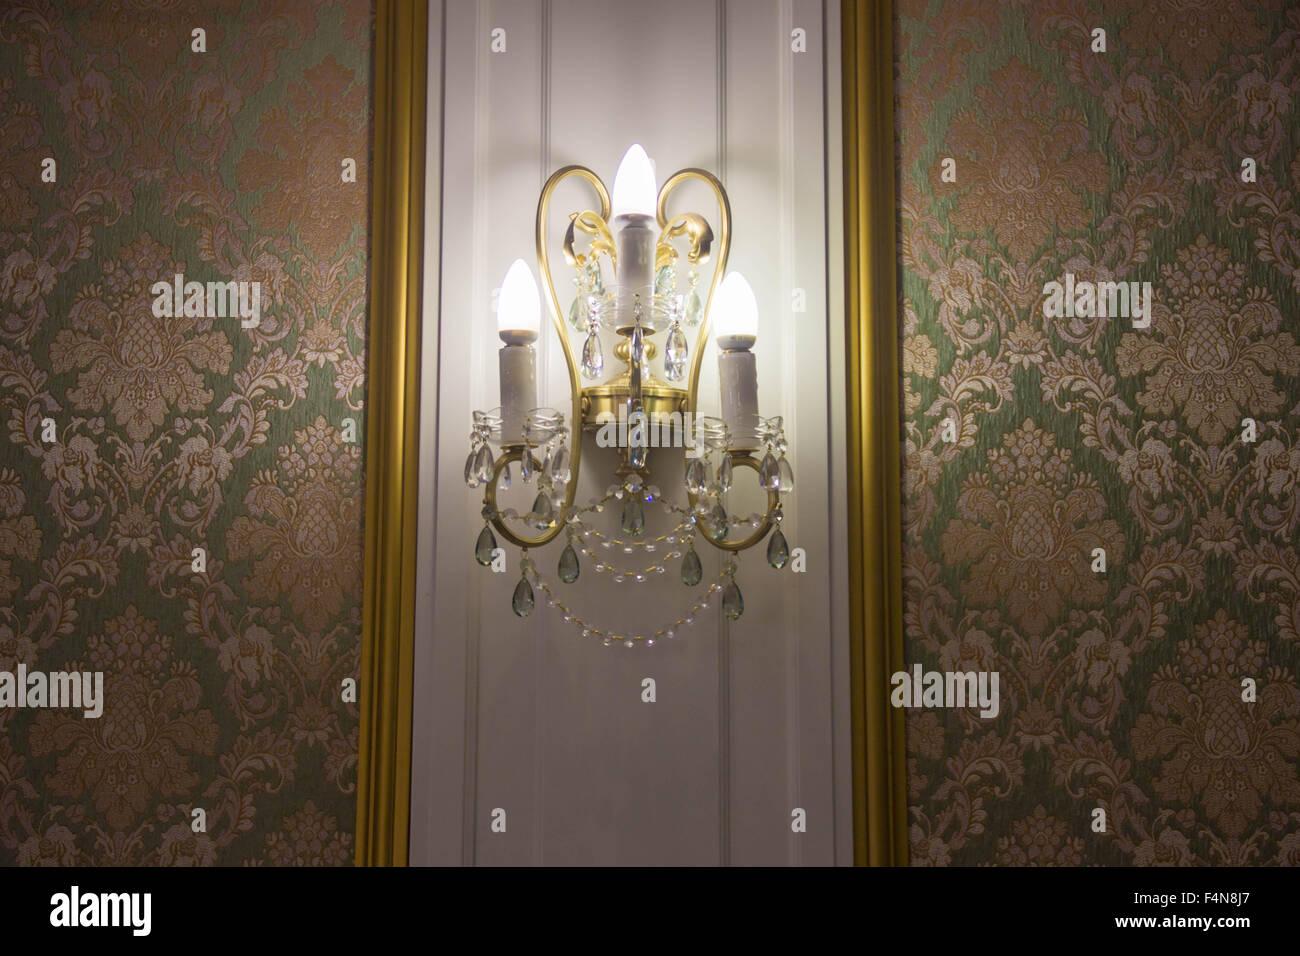 Lamp vintage antique decorative light furniture interior Stock Photo